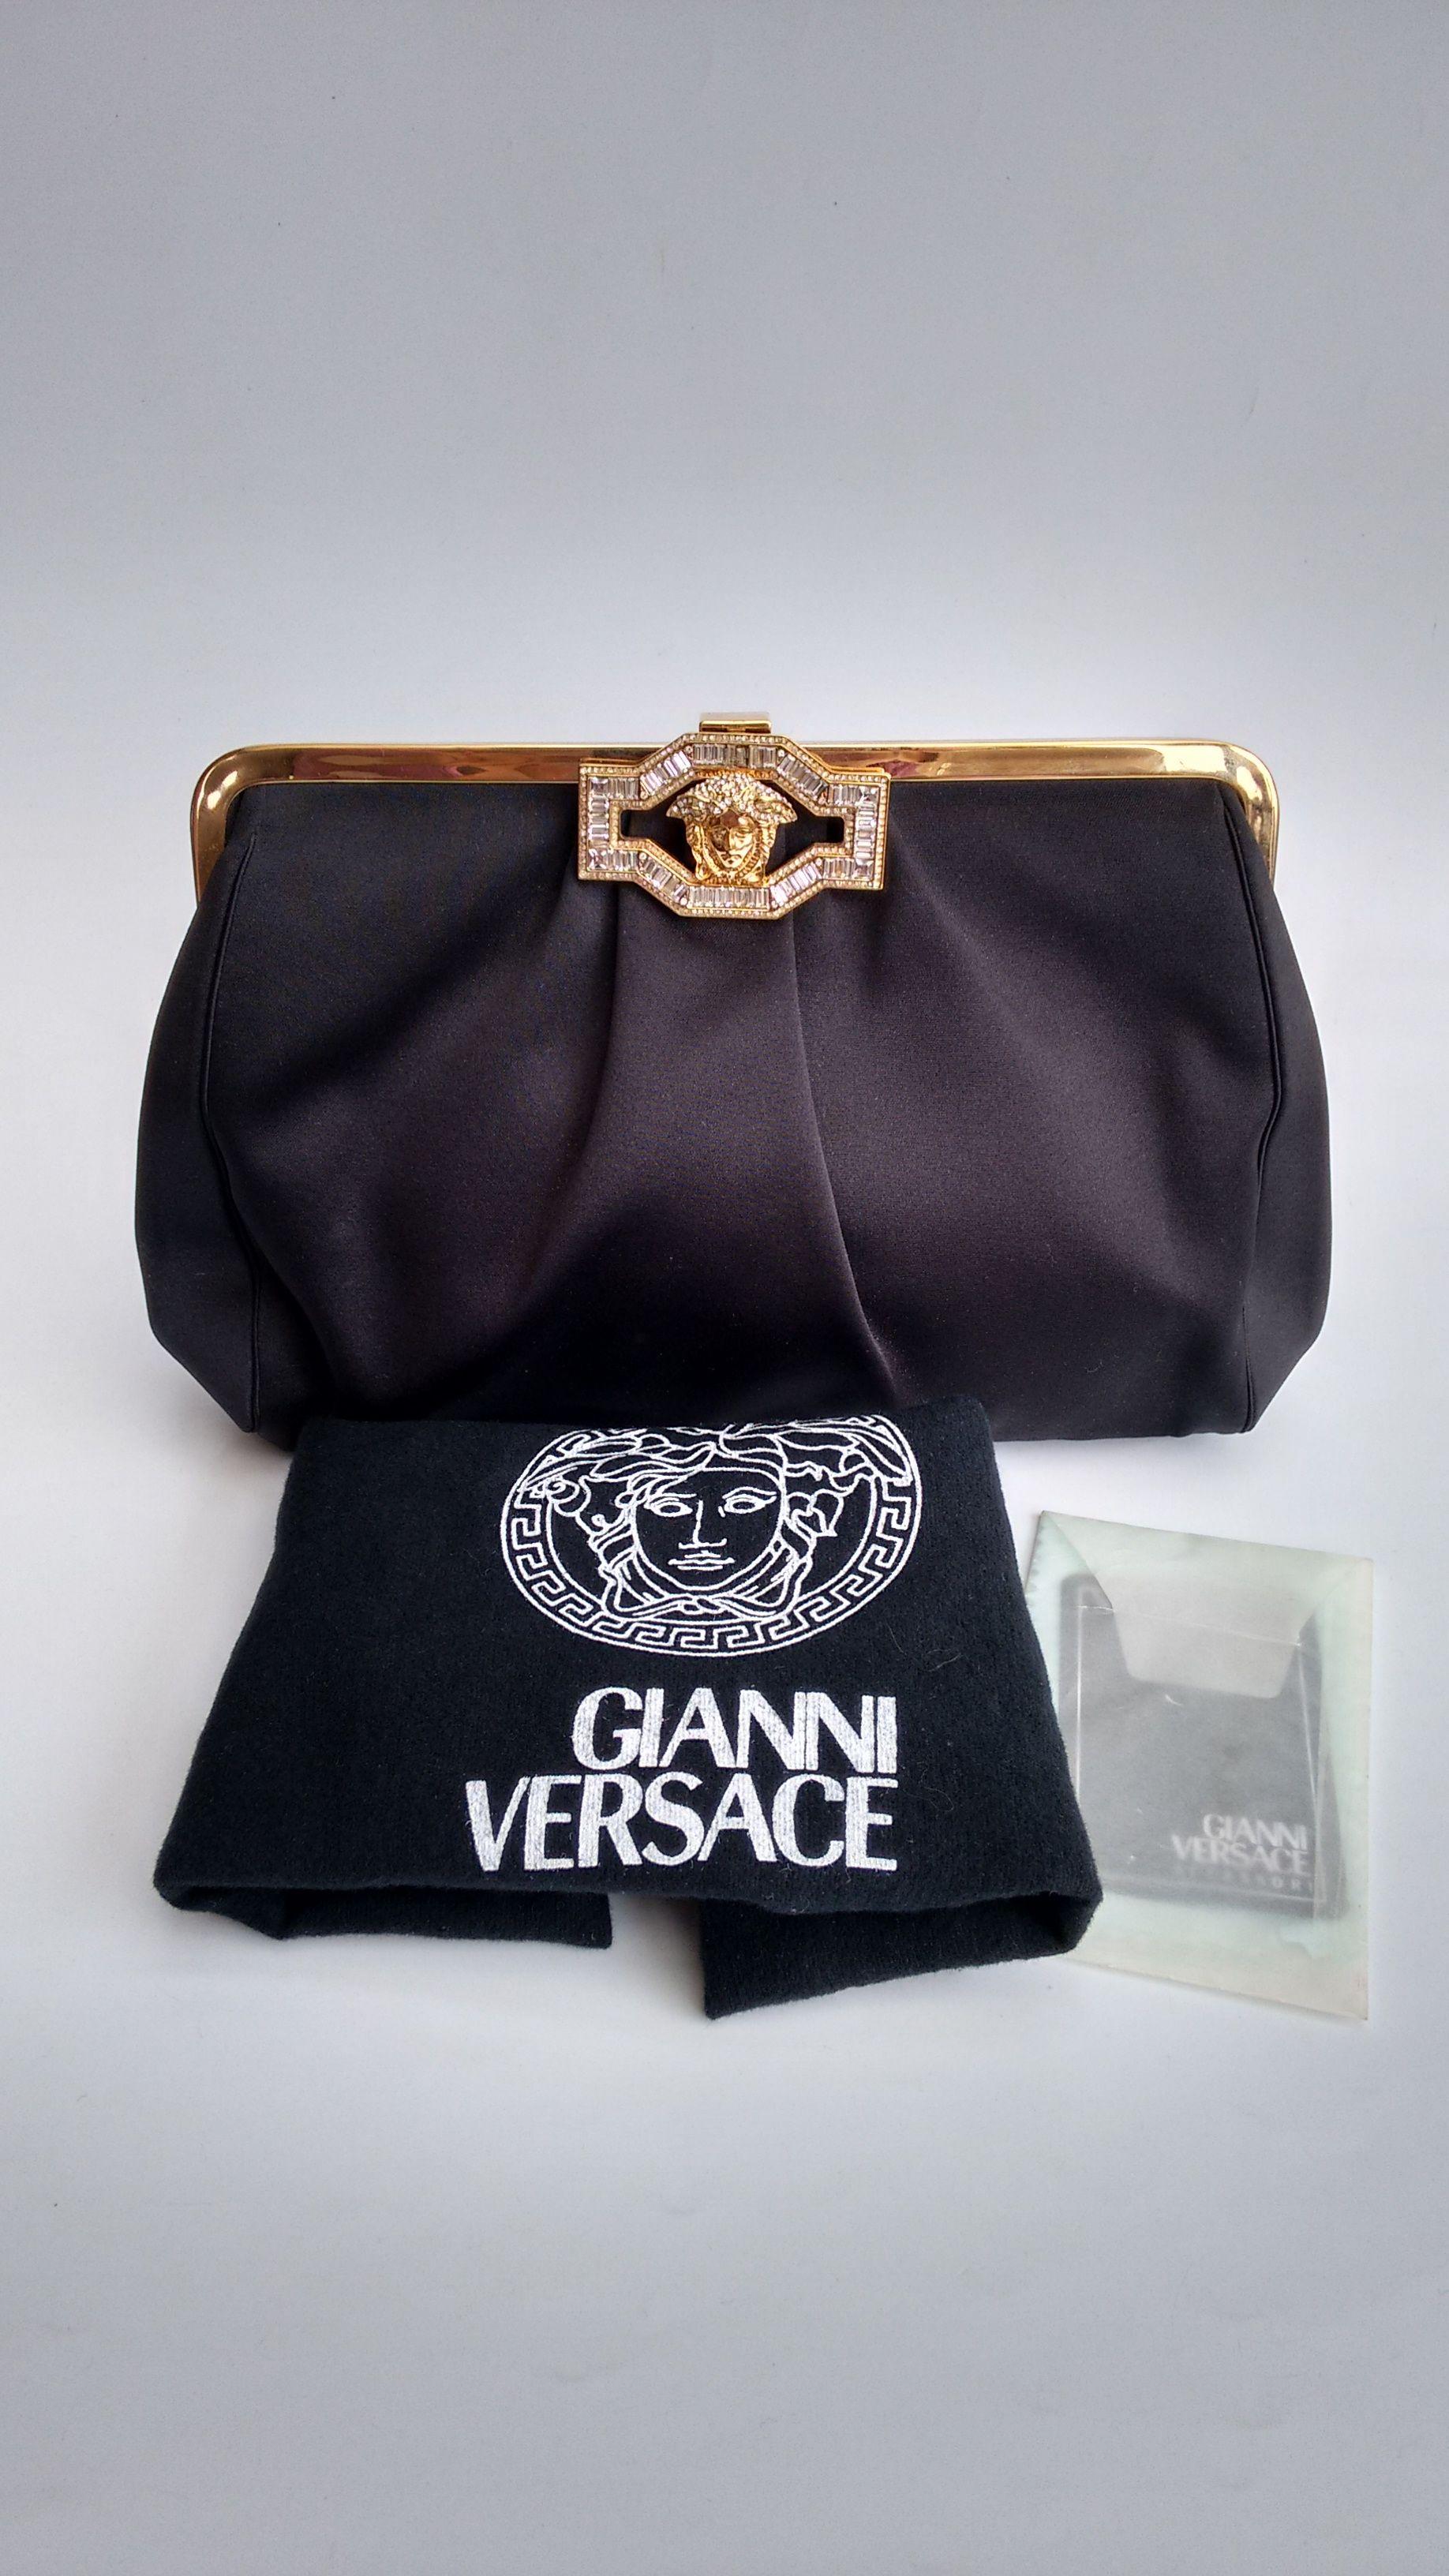 Versace Bag Gianni Versace Vintage Black Clutch Bag Italian Designer Purse Versace Bag Gianni Versace Evening Clutch Bag